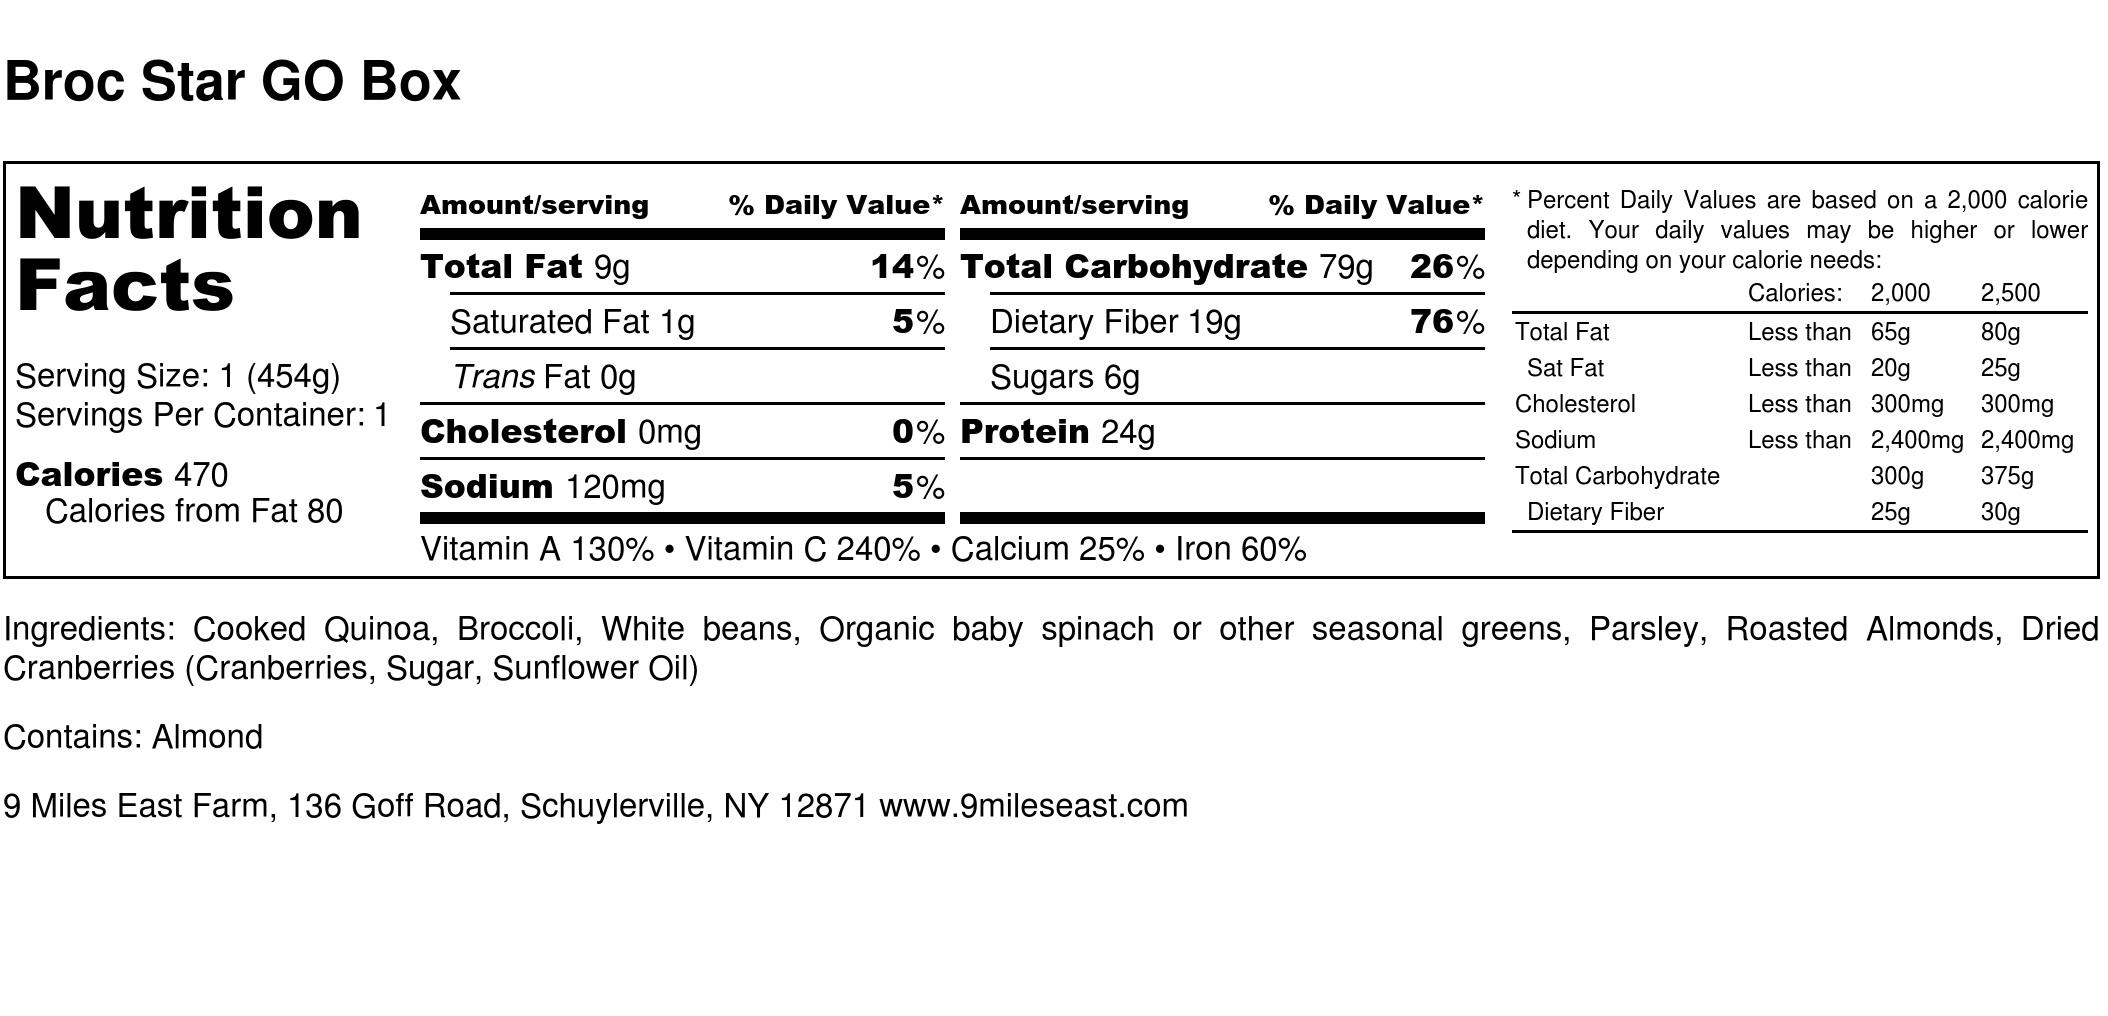 Broc Star GO Box - Nutrition Label.jpg